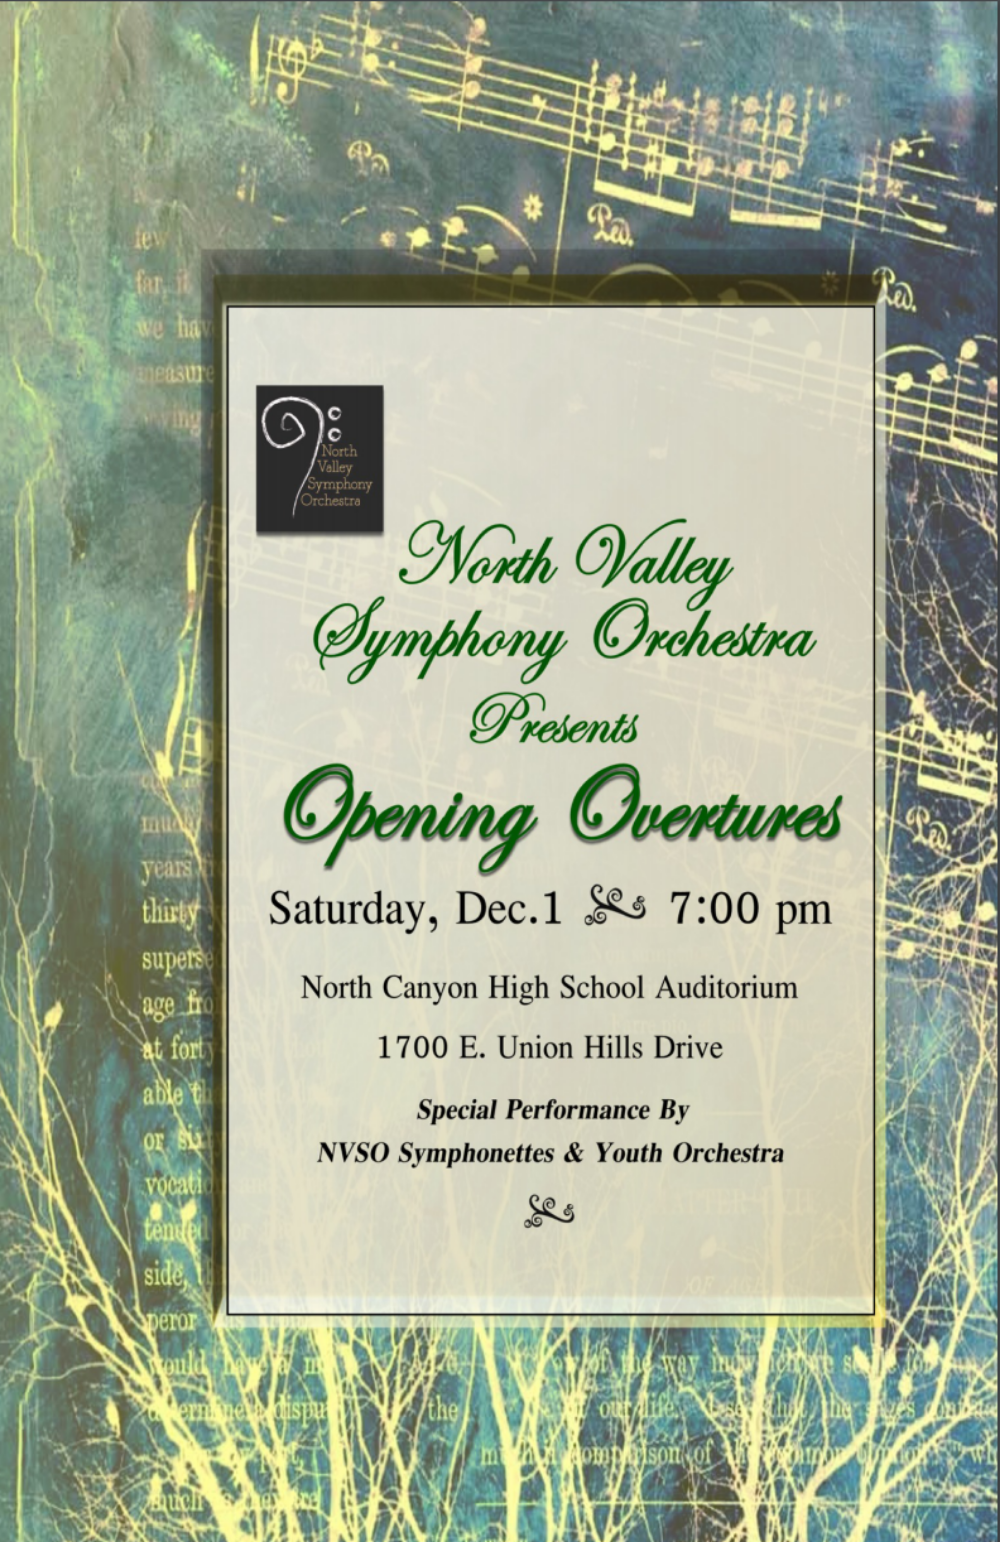 Opening Overtures - December 1, 2012